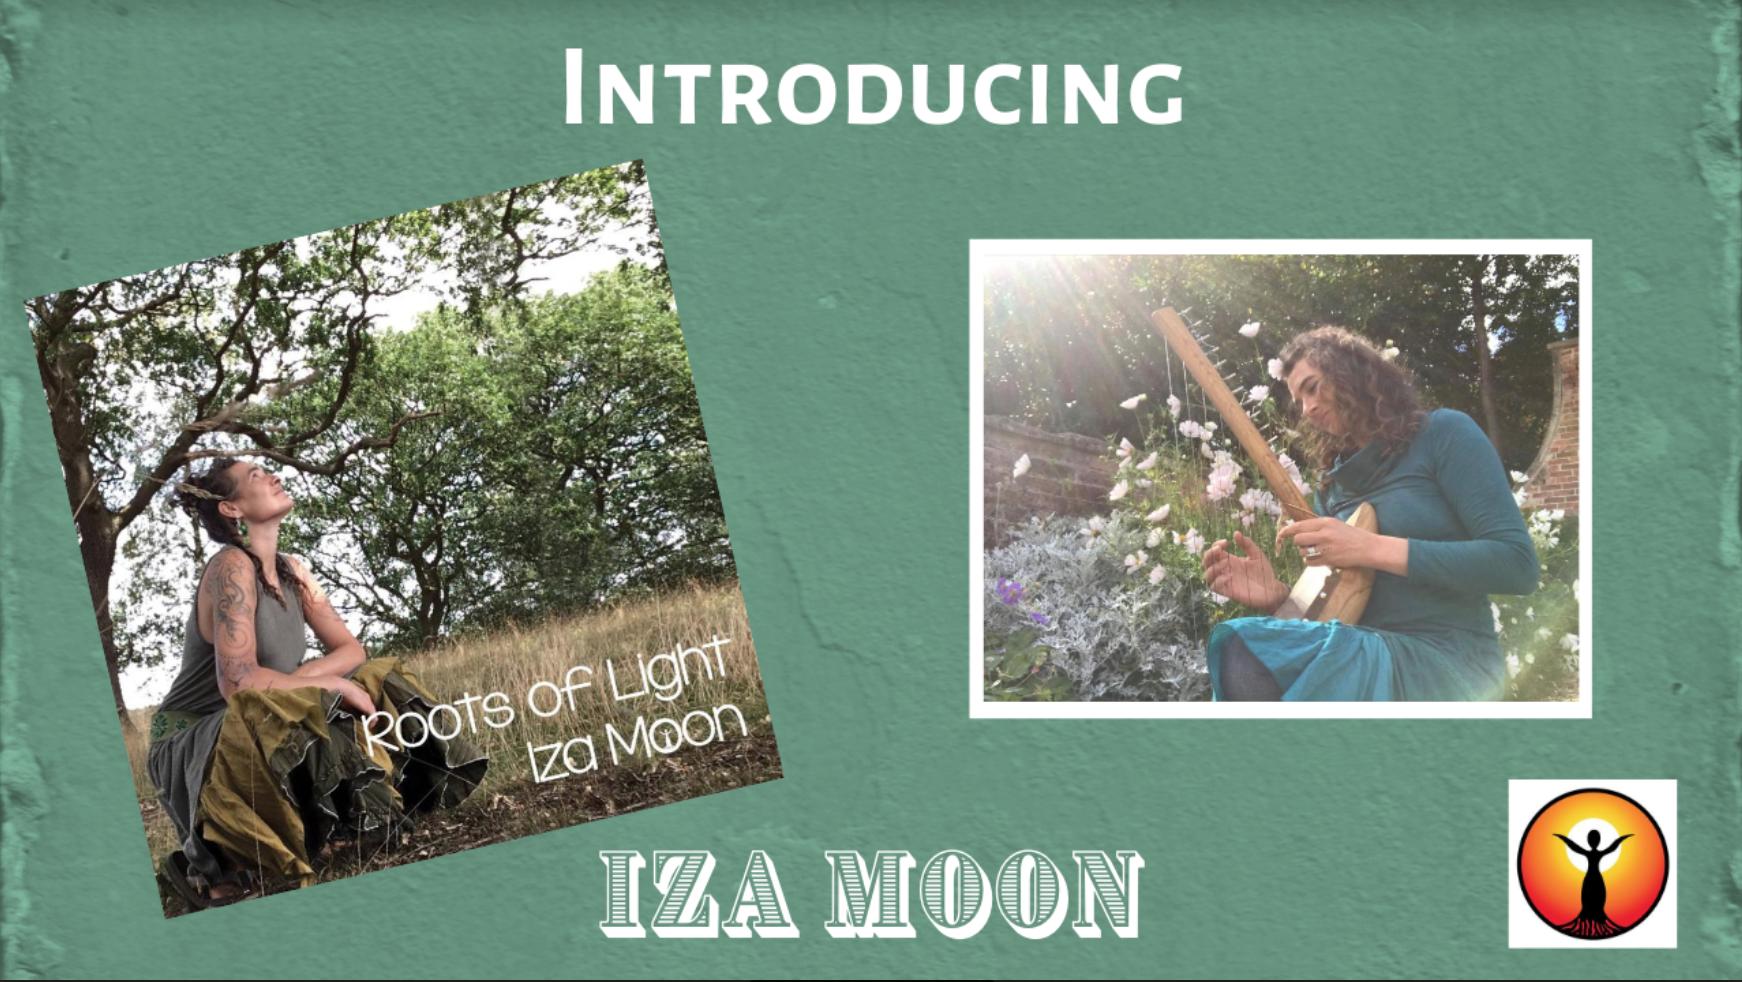 THE MAGICAL IZA MOON